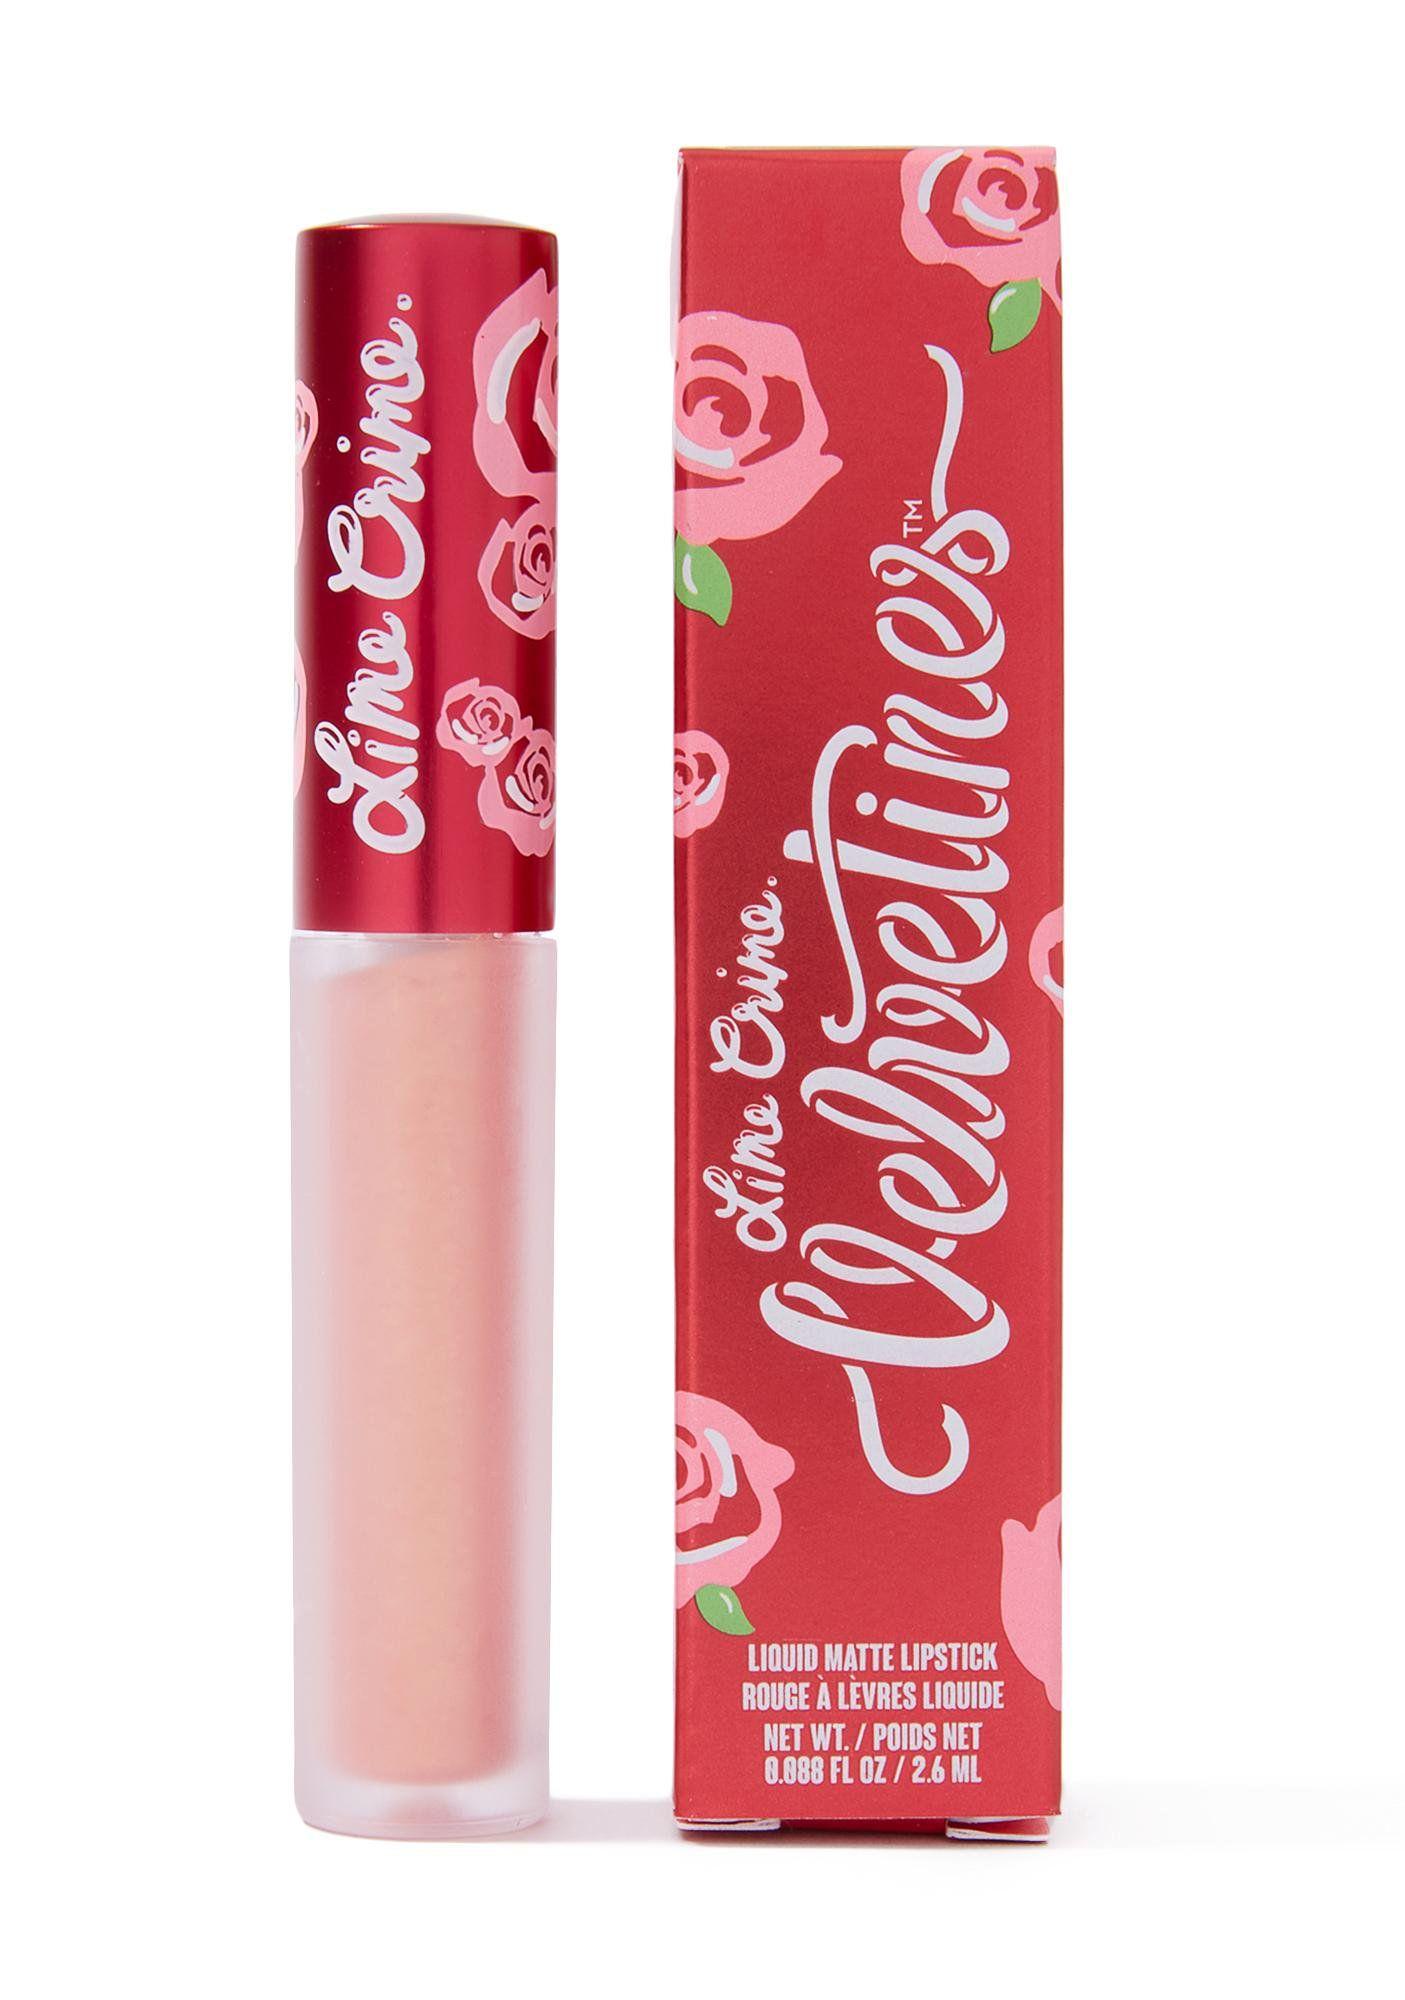 Siren Metallic Velvetine Liquid Lipstick Liquid lipstick